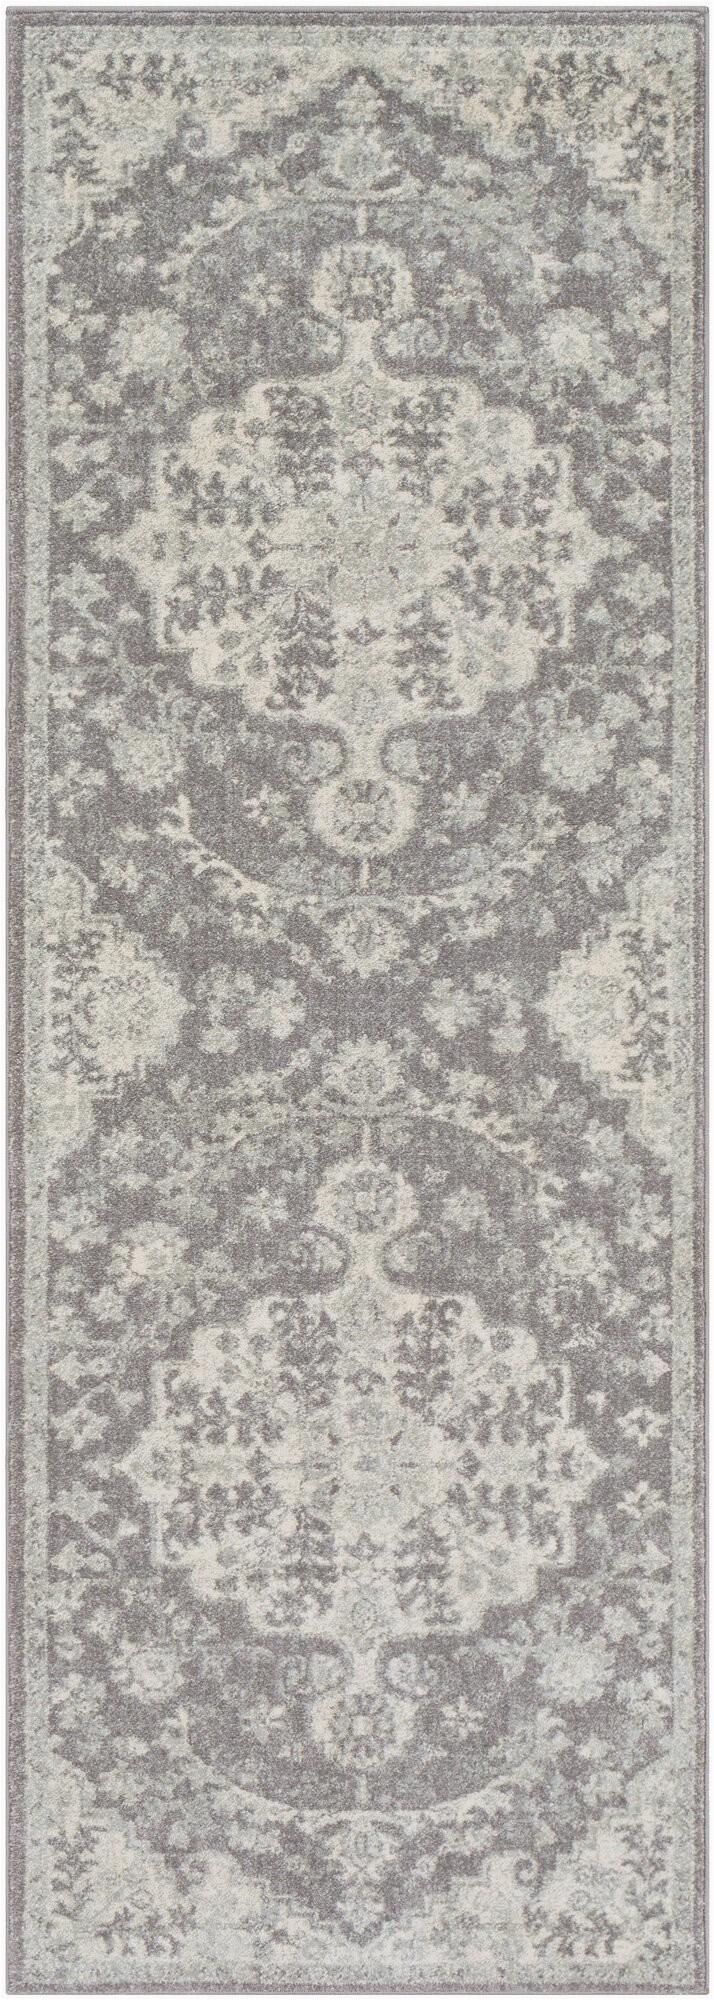 mistana hillsby oriental light graycharcoal area rug mitn2360 piid=